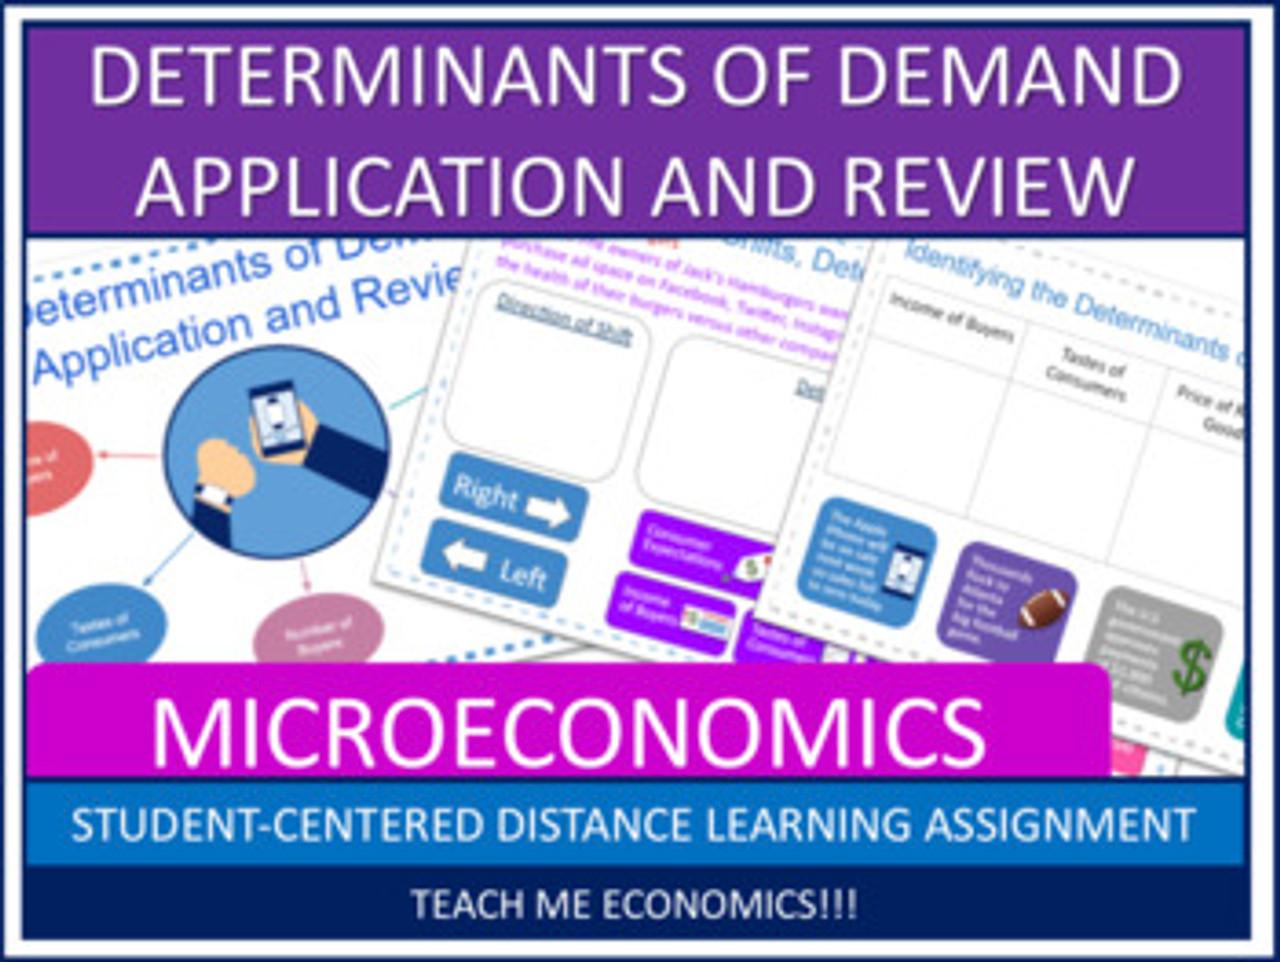 Determinants of Demand Review, Economics Microeconomics, Printable or Google